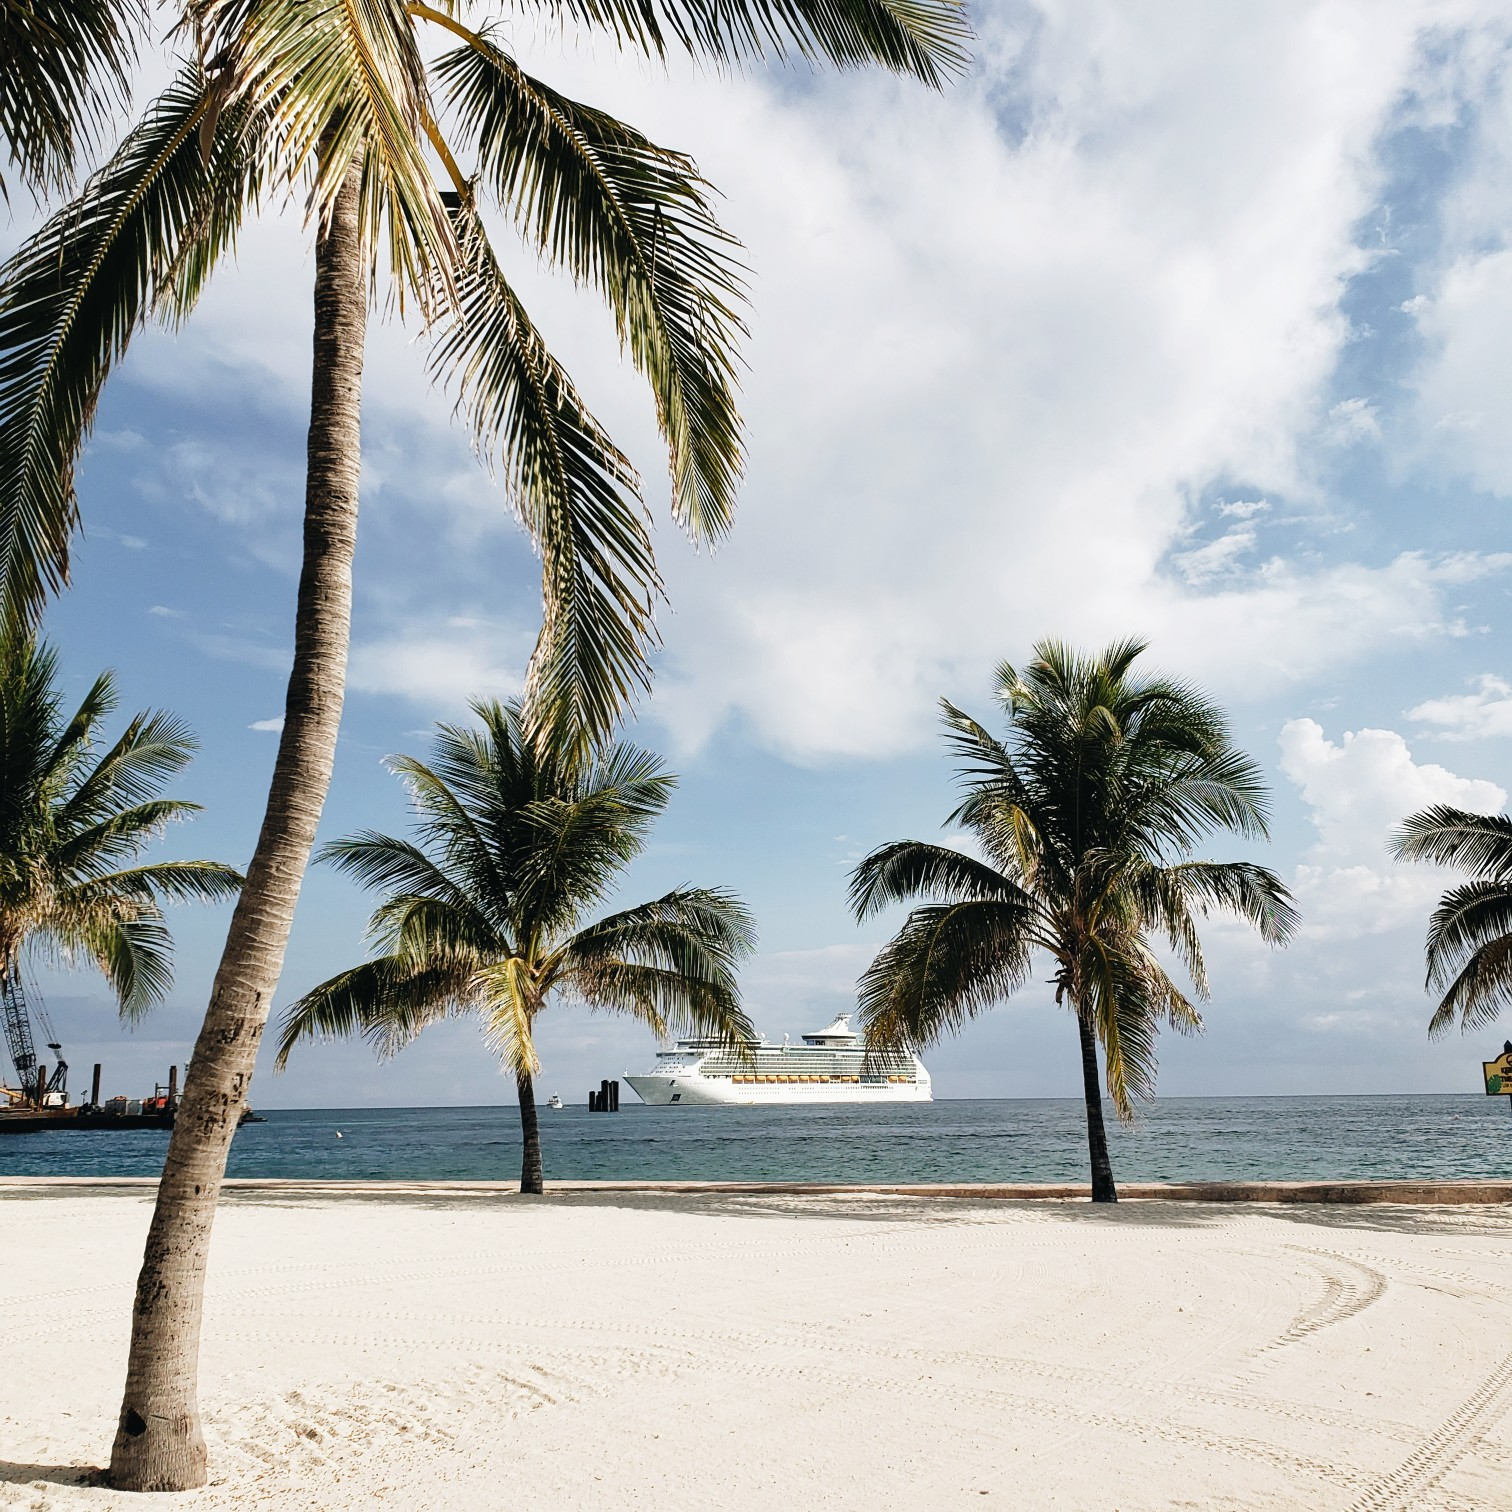 royal caribbean mariner of the seas deck next to Cococay Island Bahamas Full of Palm Trees